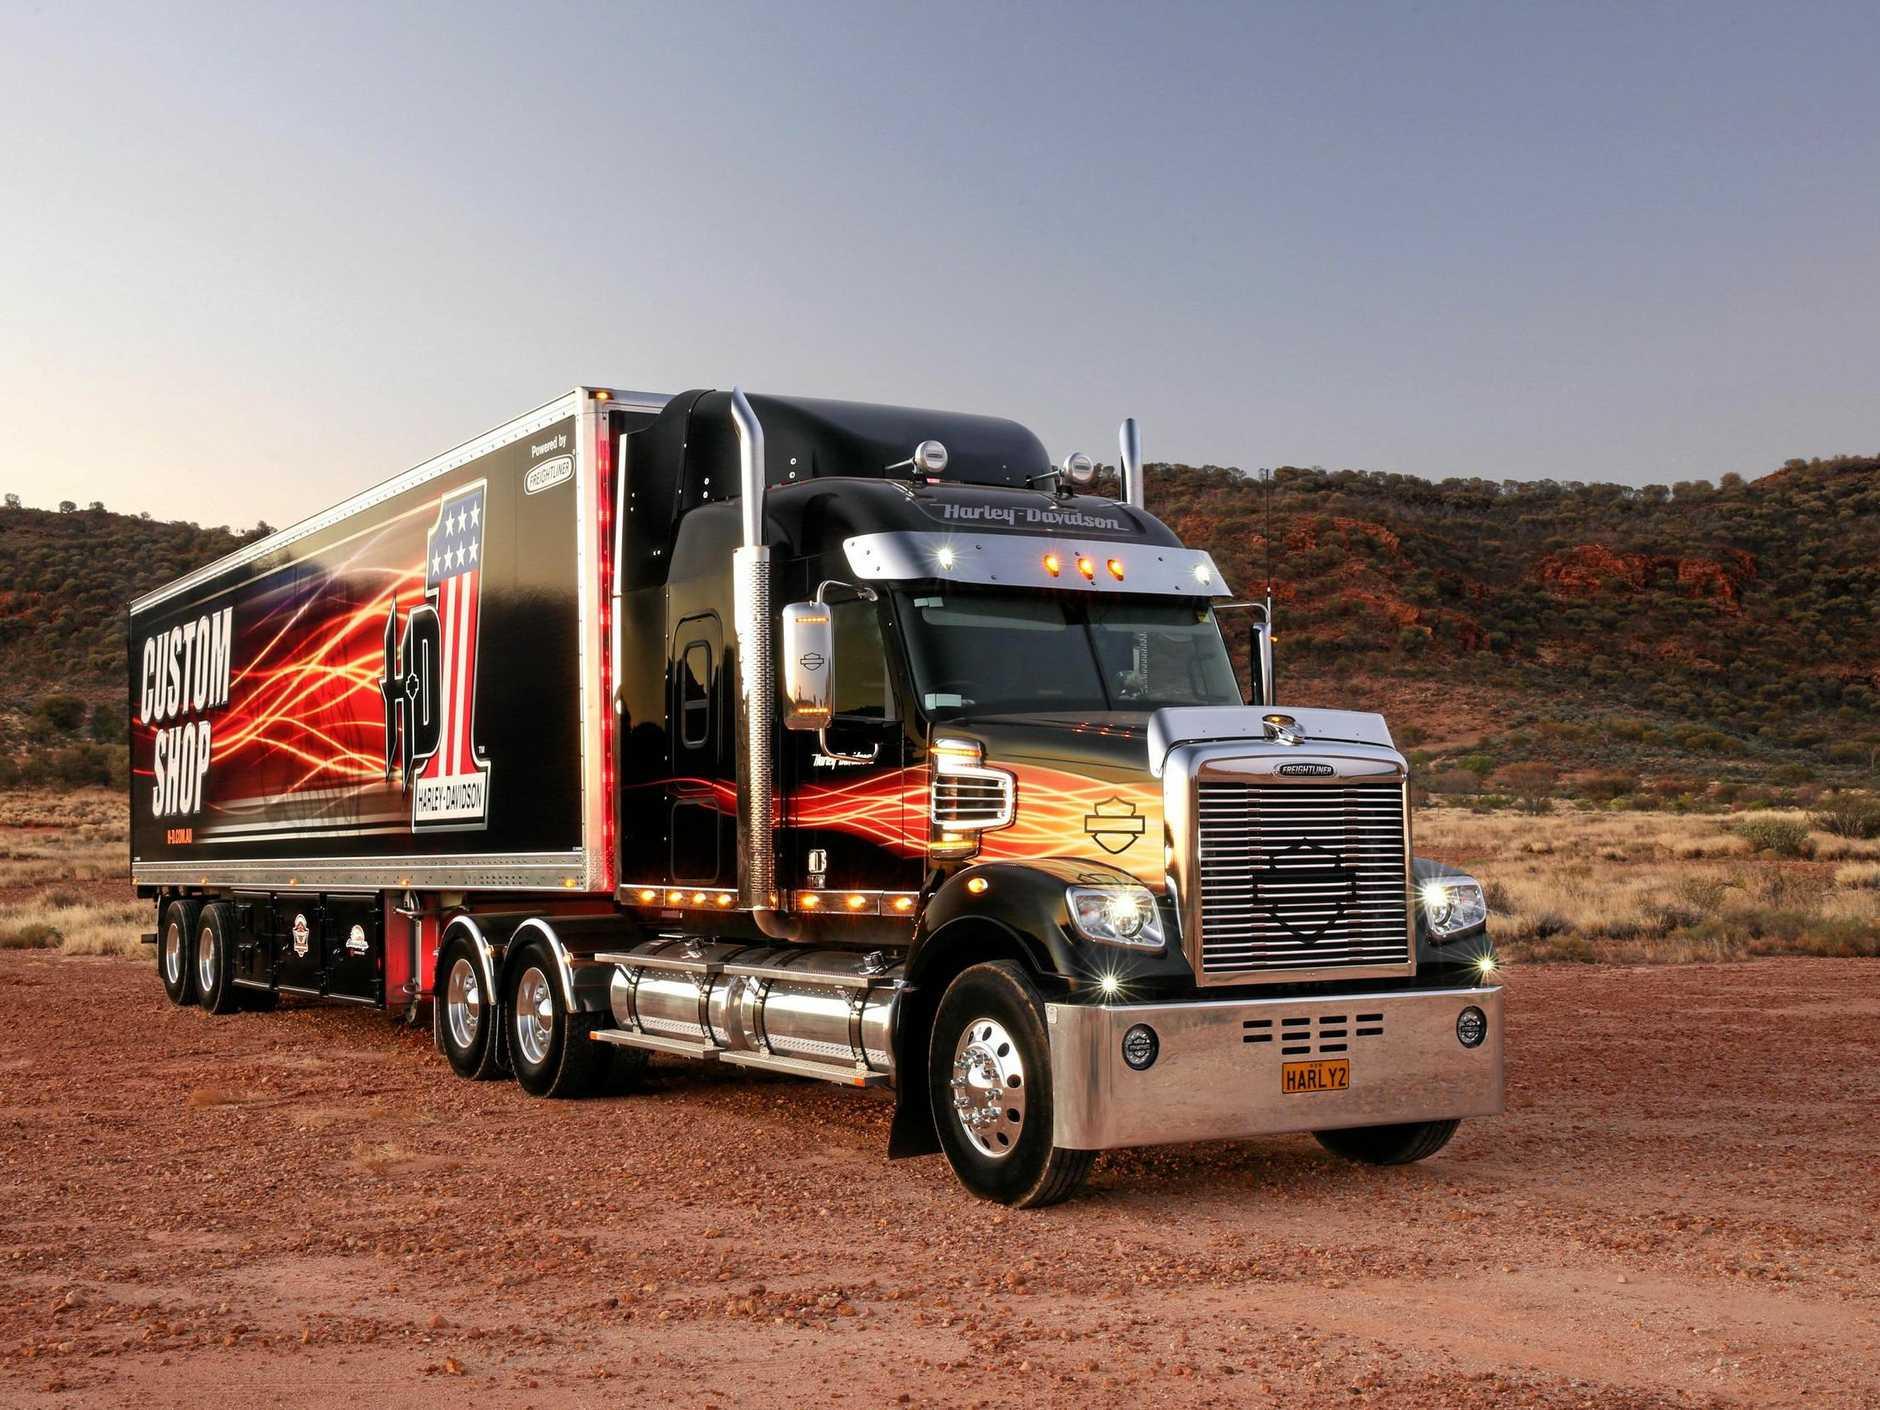 Harley Truck